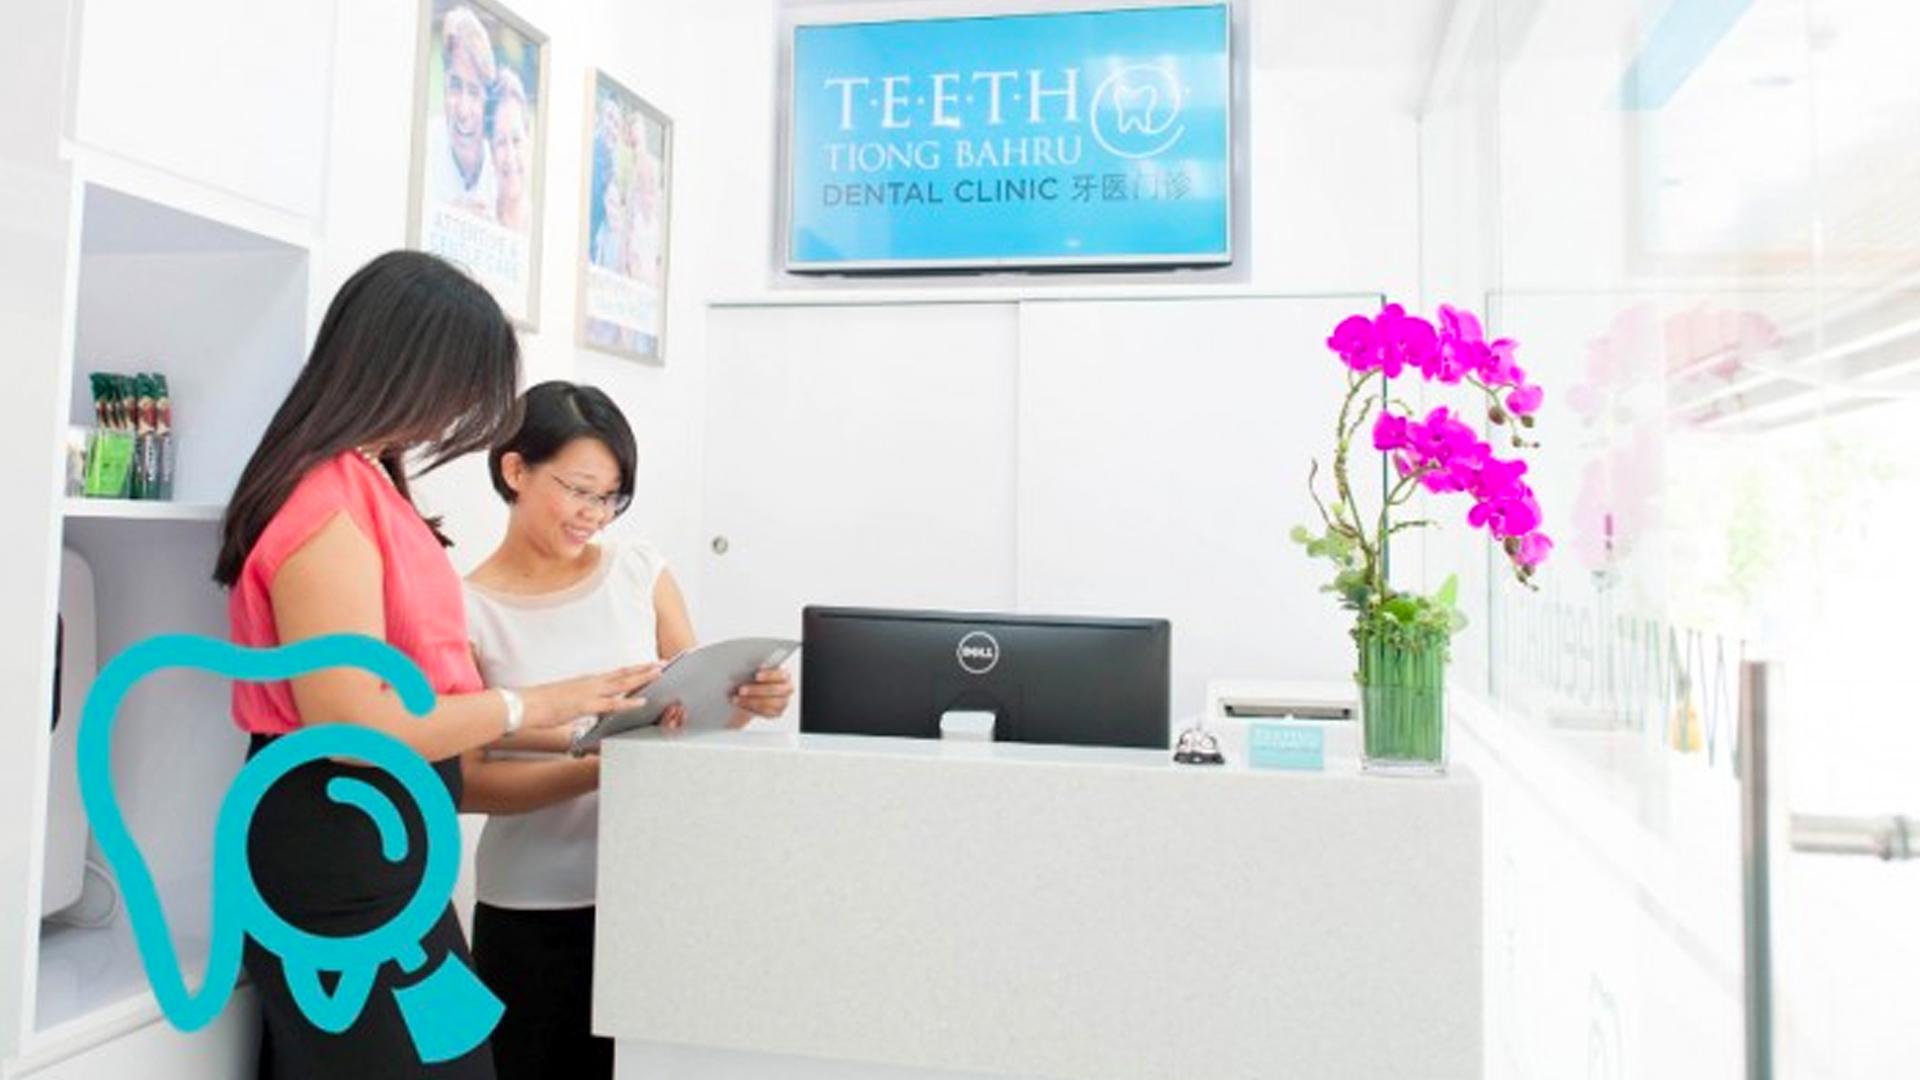 TEETH Tiong Bahru neighborhood dental clinic general dentistry